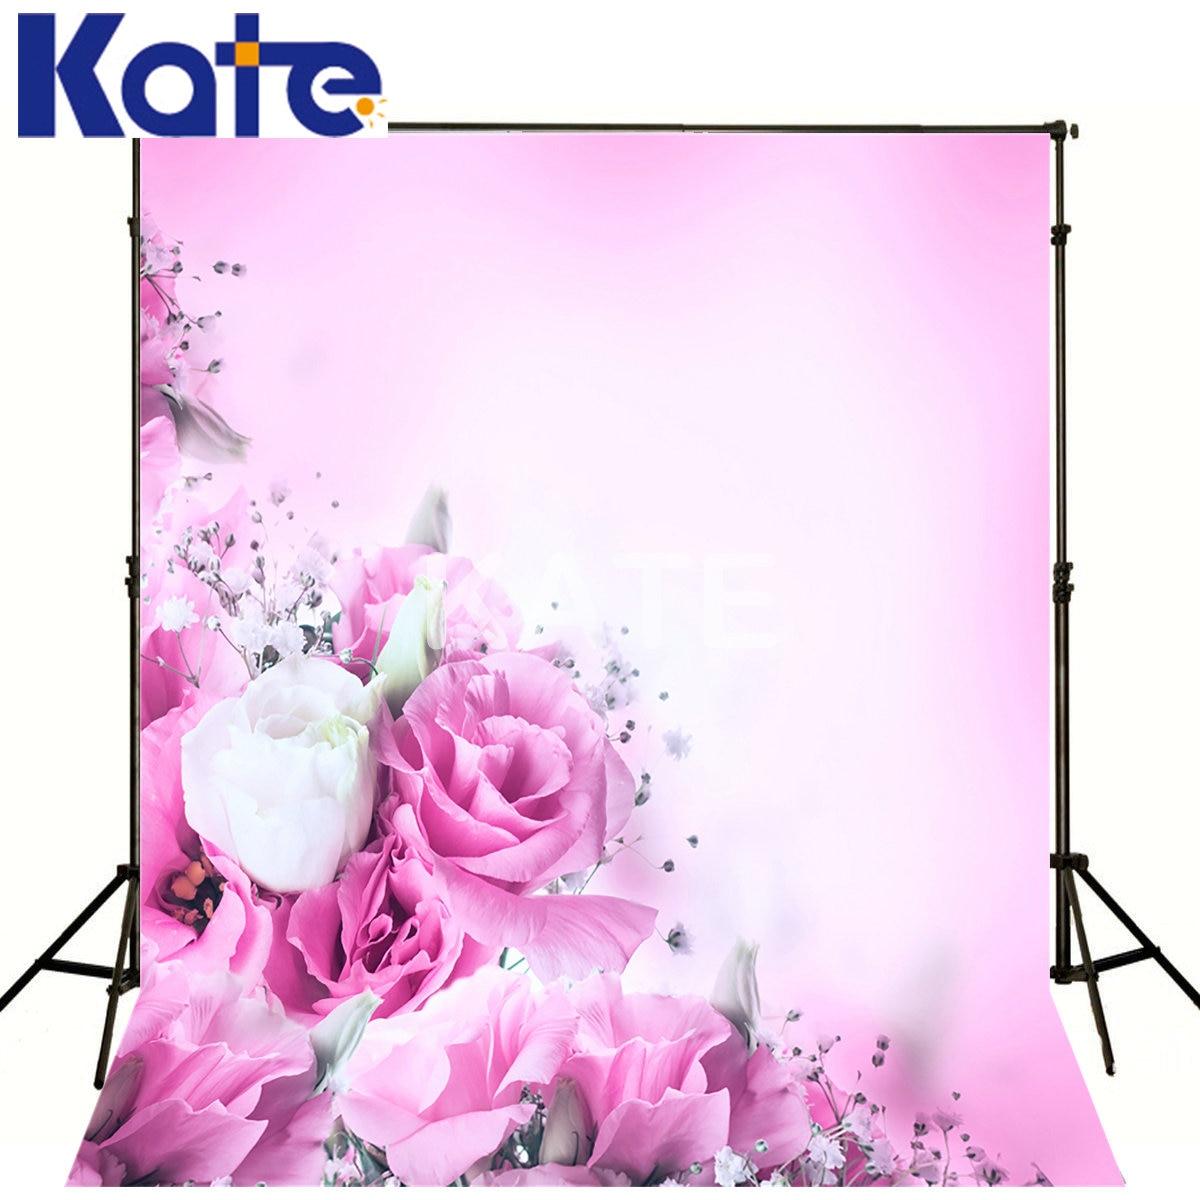 KATE Photo Background Wedding Photo Backdrop Floral Backdrop Scenic Photography Backdrops Children Background for Studio